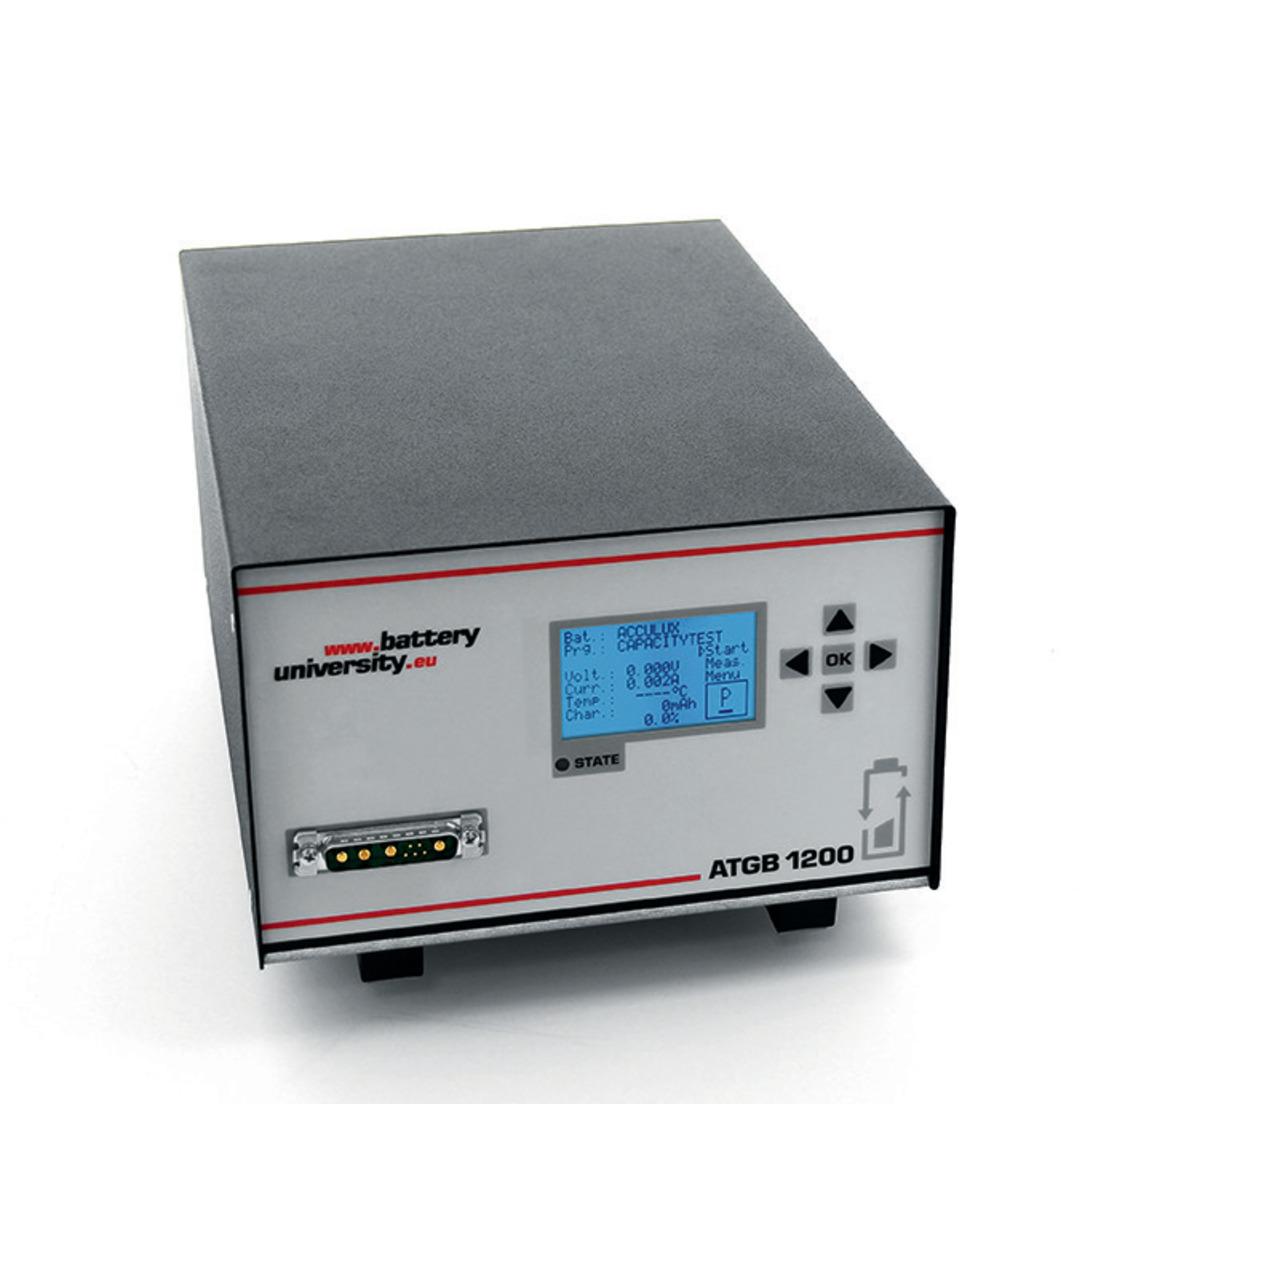 battery university Akku-Tester- -Ladegerät ATGB 1200